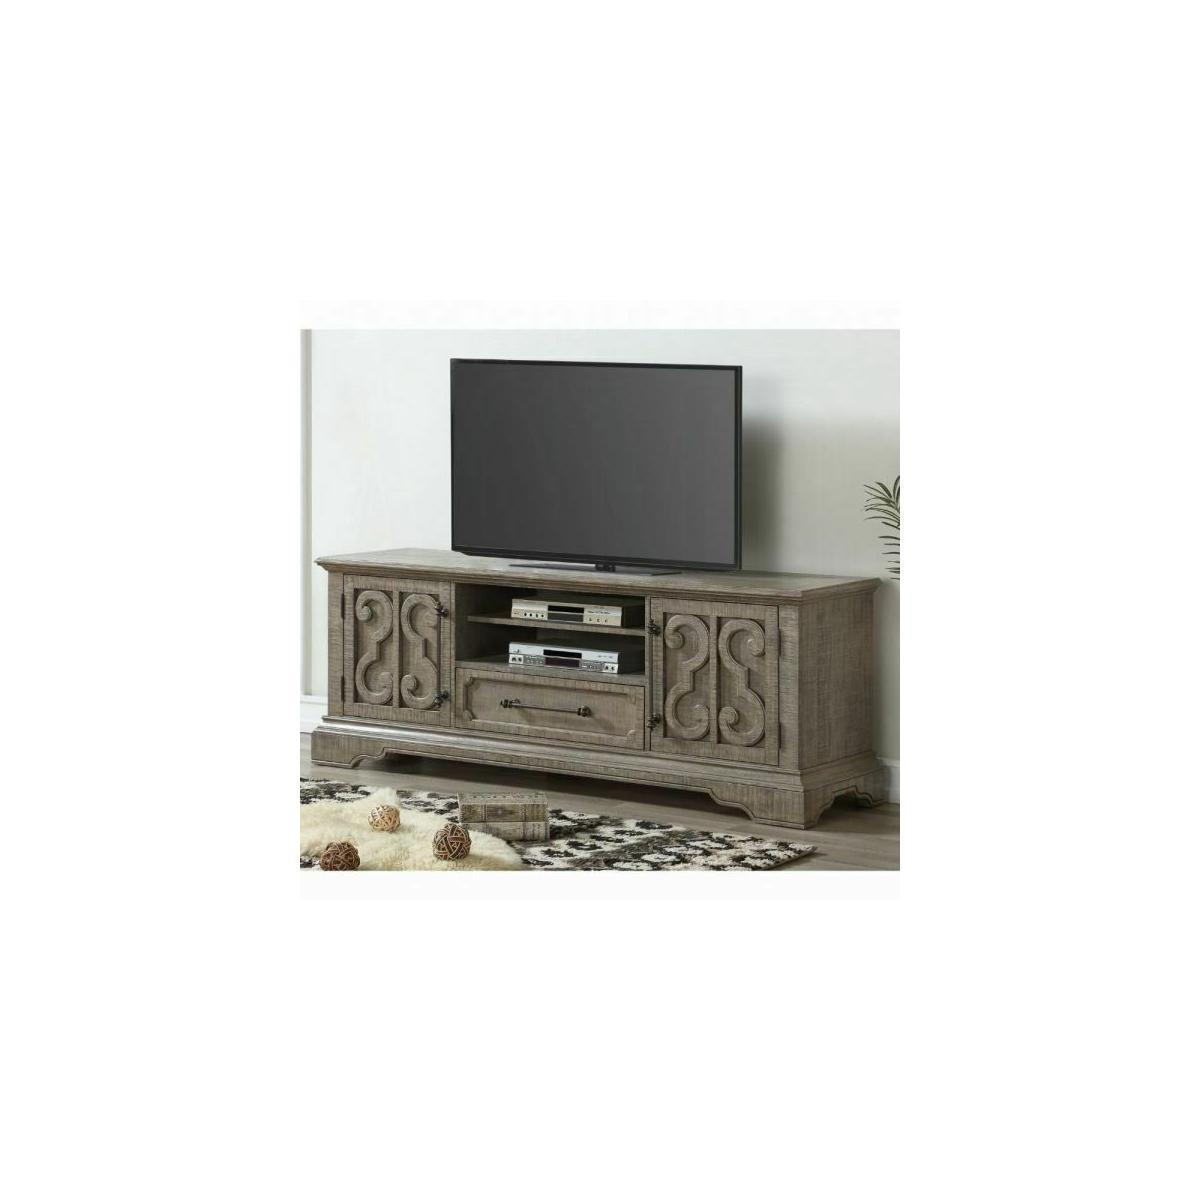 ACME Artesia TV Stand - 91765 - Salvaged Natural